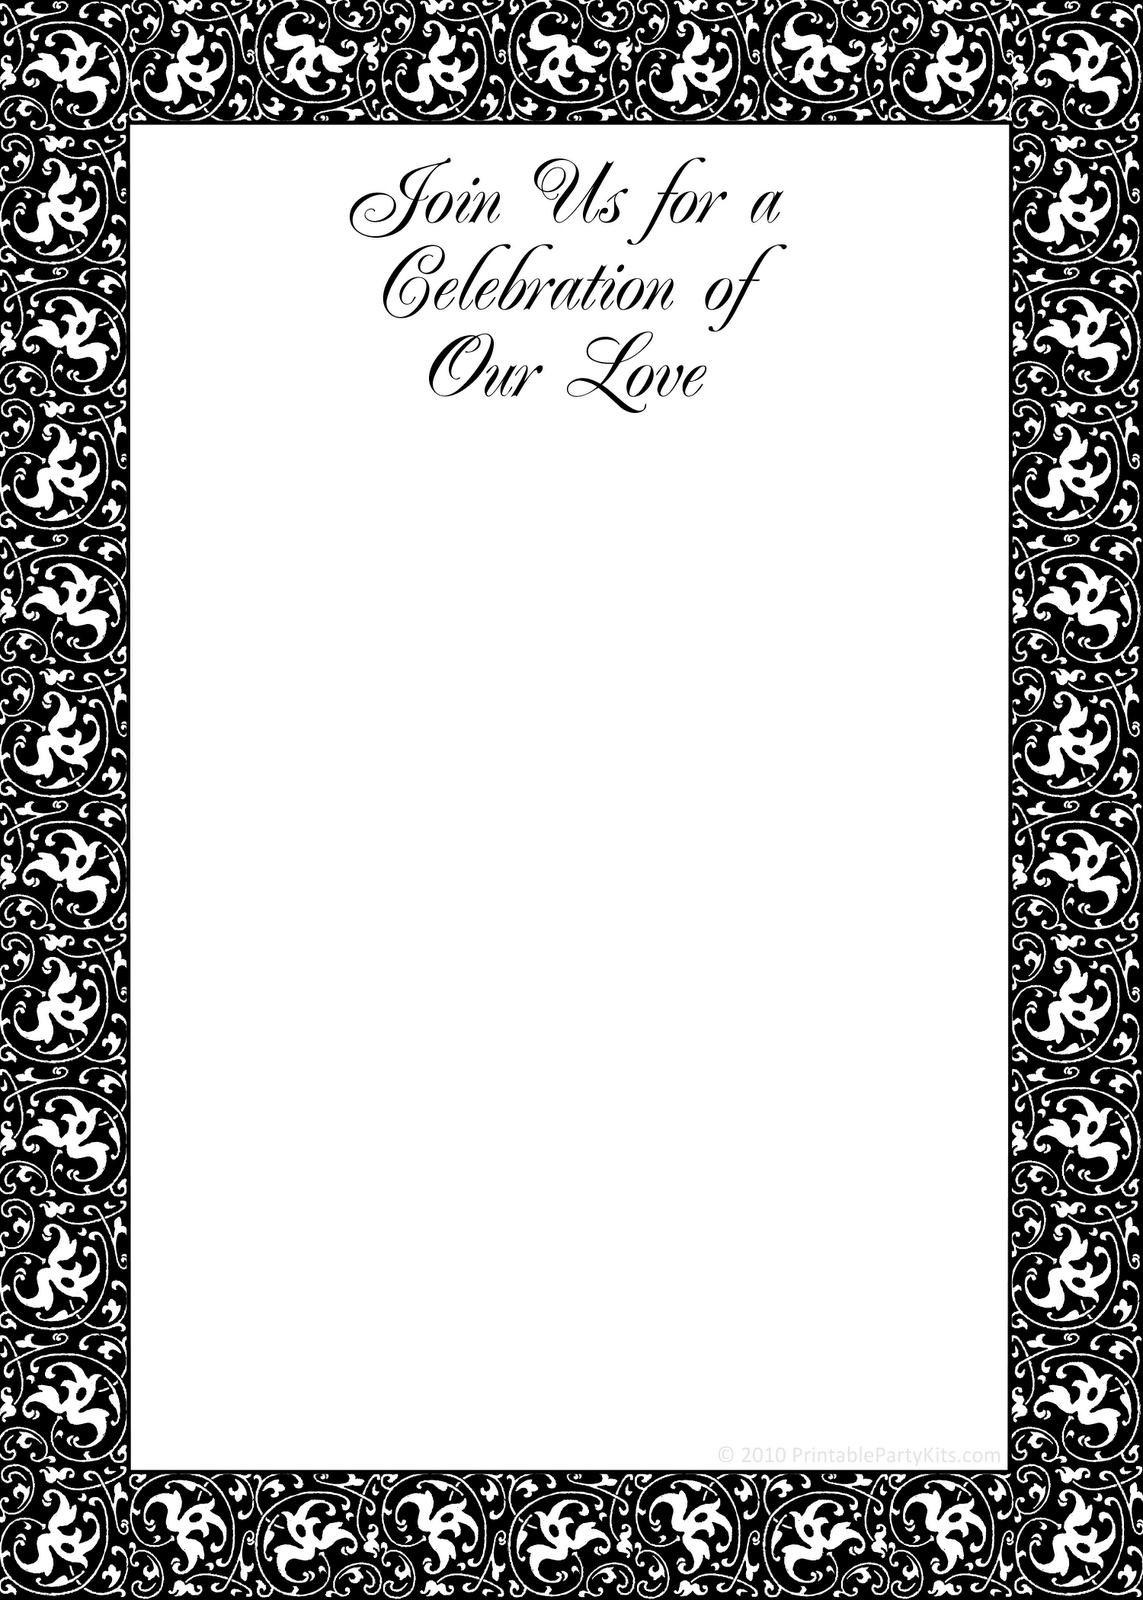 017 Template Ideas Free Printable Housewarming Partys Templates 9 - Free Printable Housewarming Invitations Cards